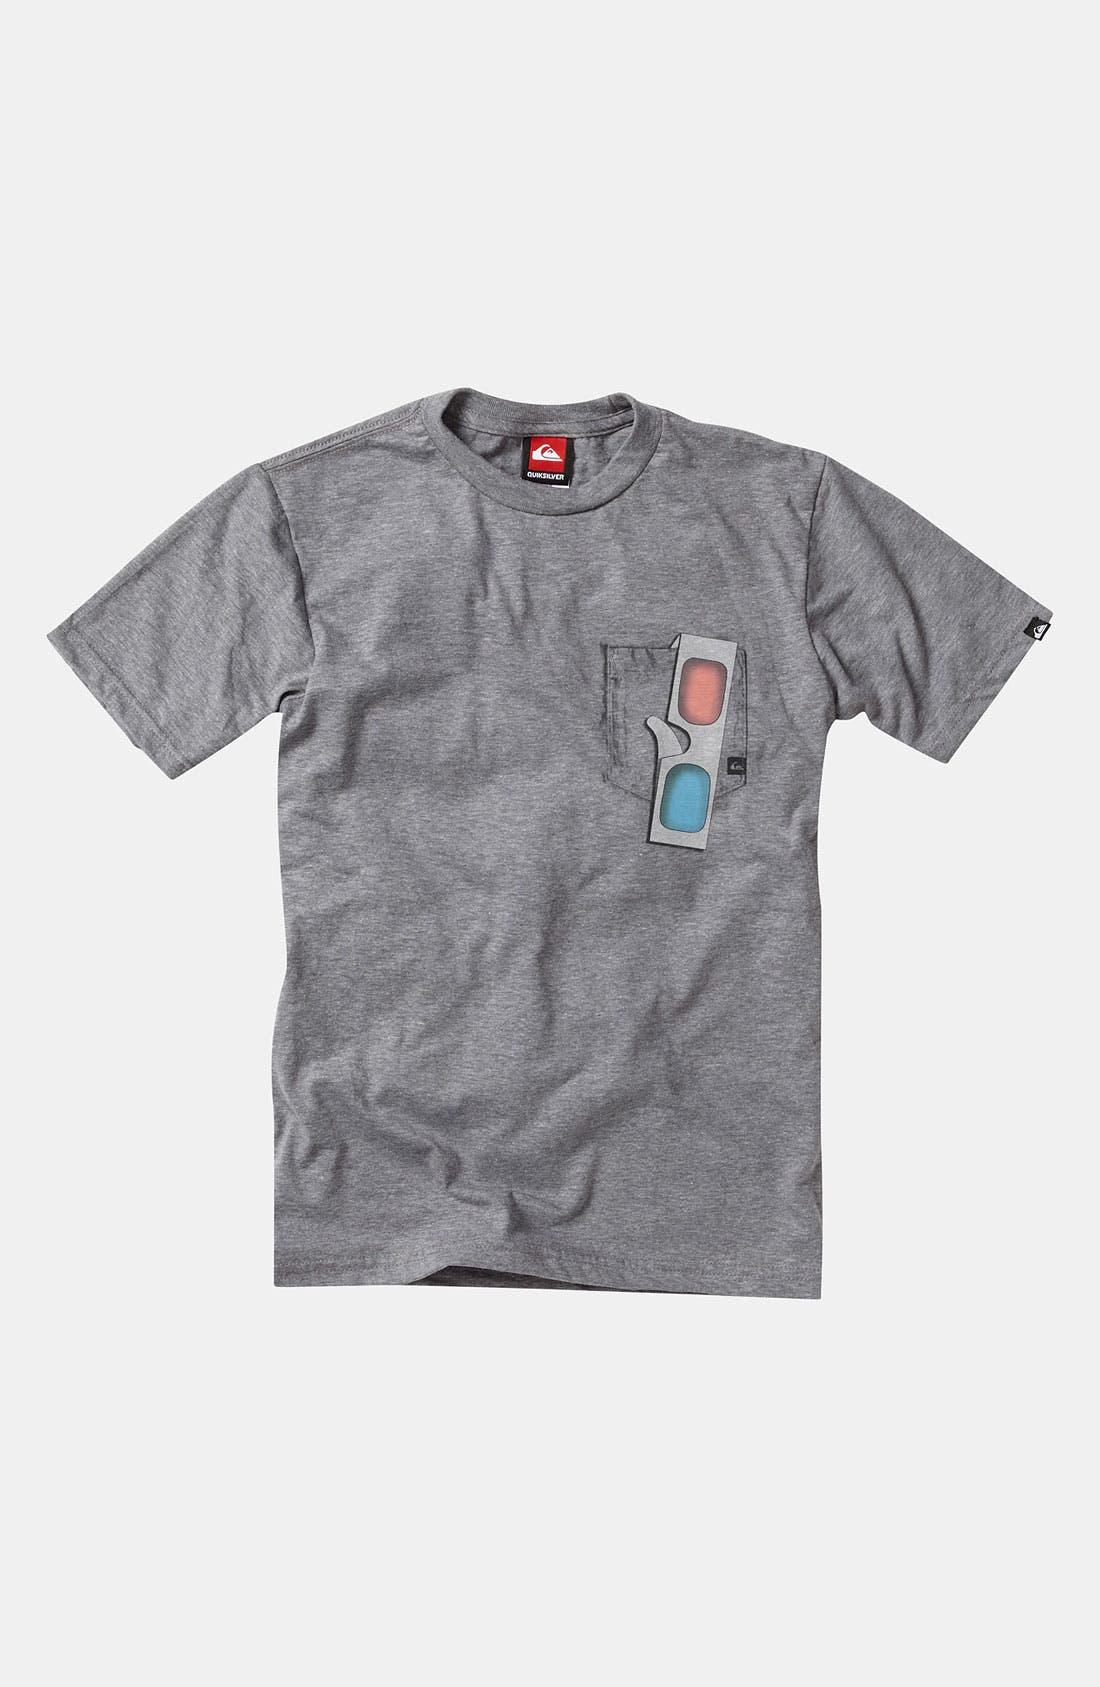 Main Image - Quiksilver '3D Fake Out' T-Shirt (Big Boys)